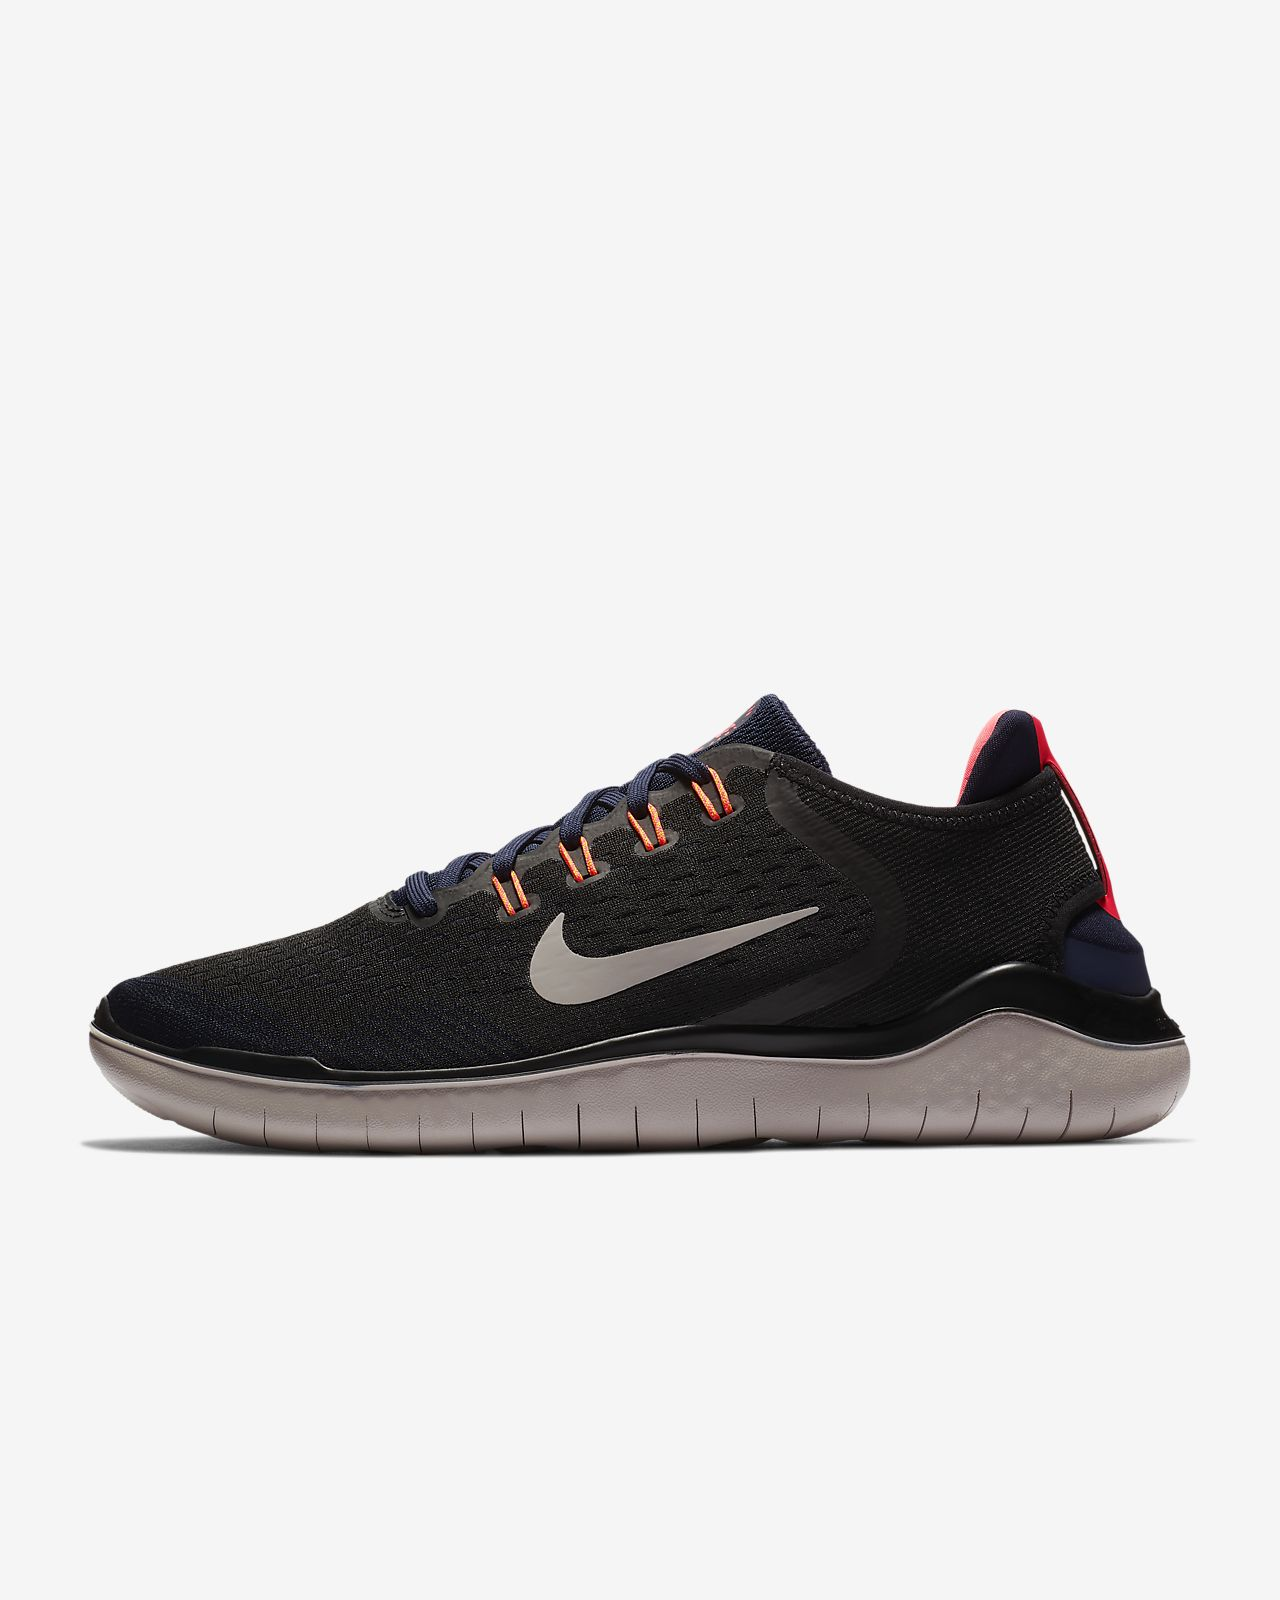 Calzado de running para hombre Nike Free RN 2018